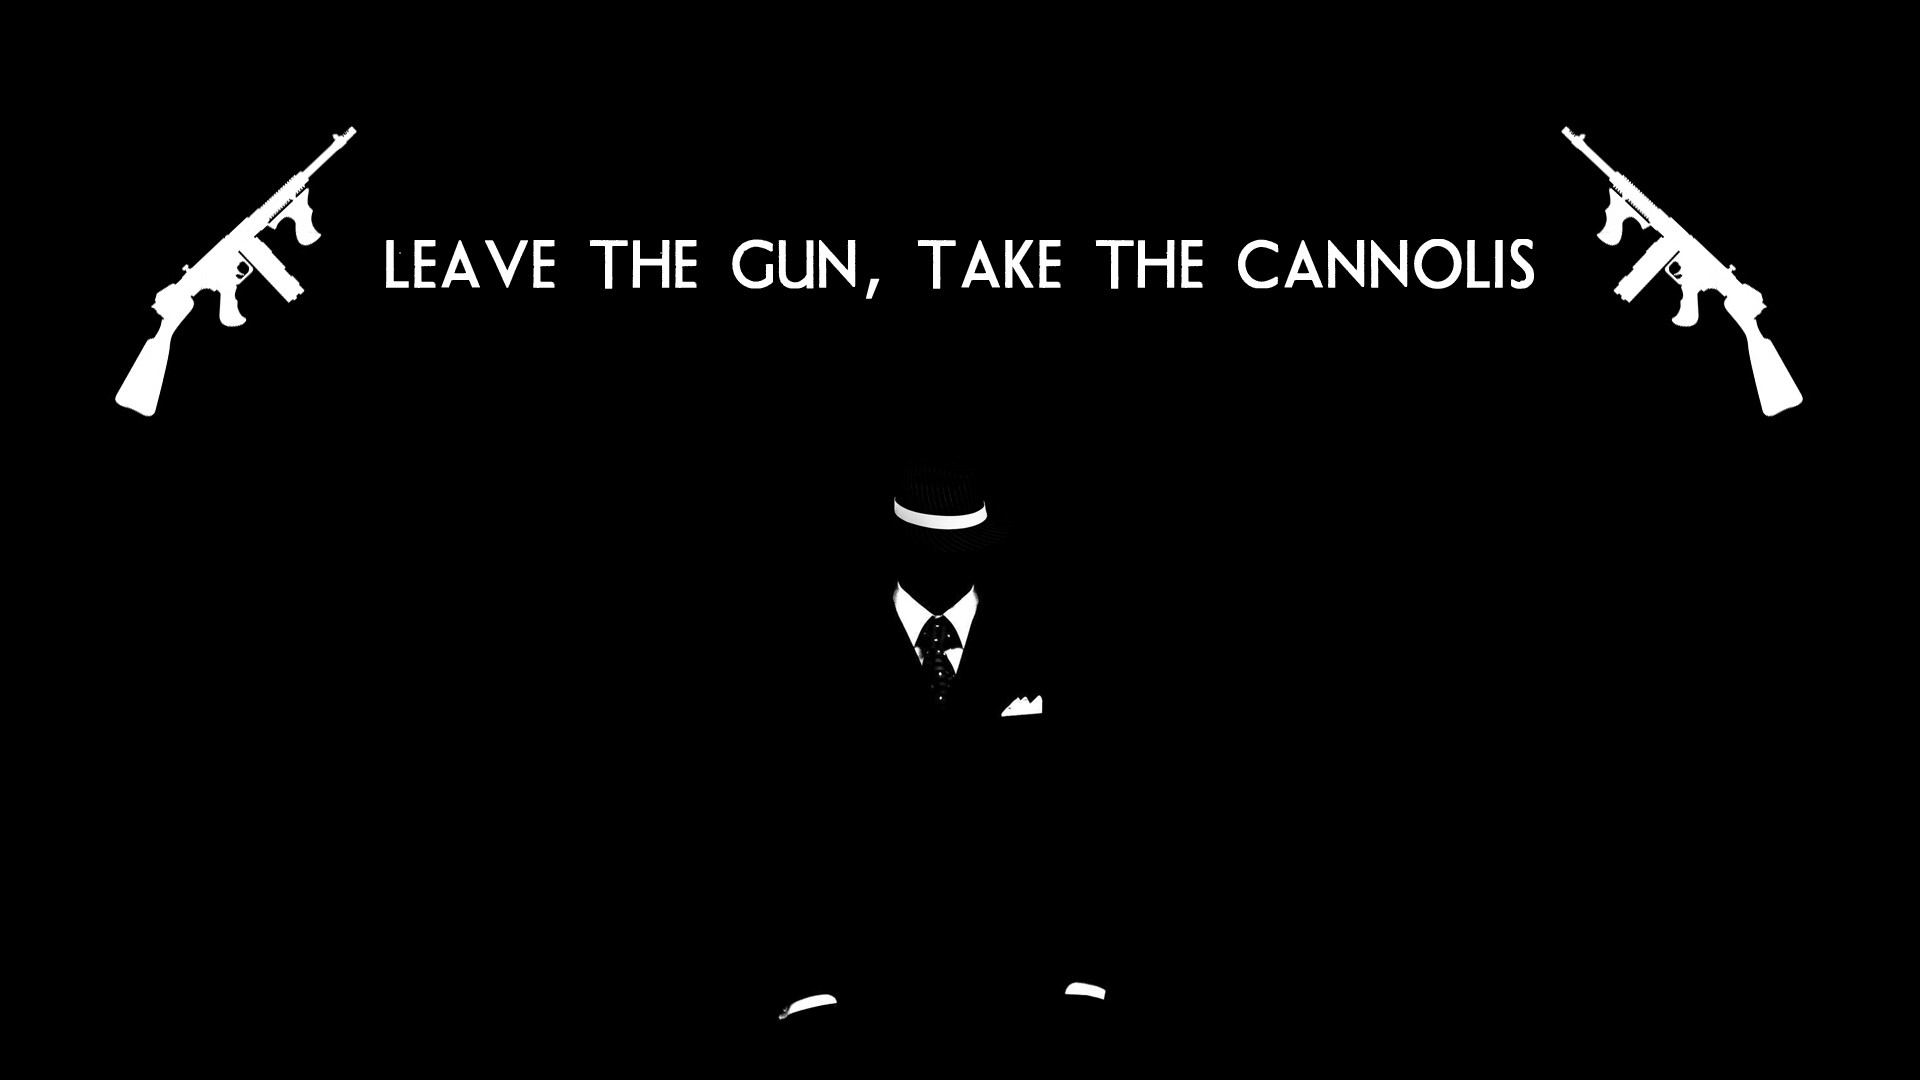 Mafia Weapons Movies Mafia Weapons Text